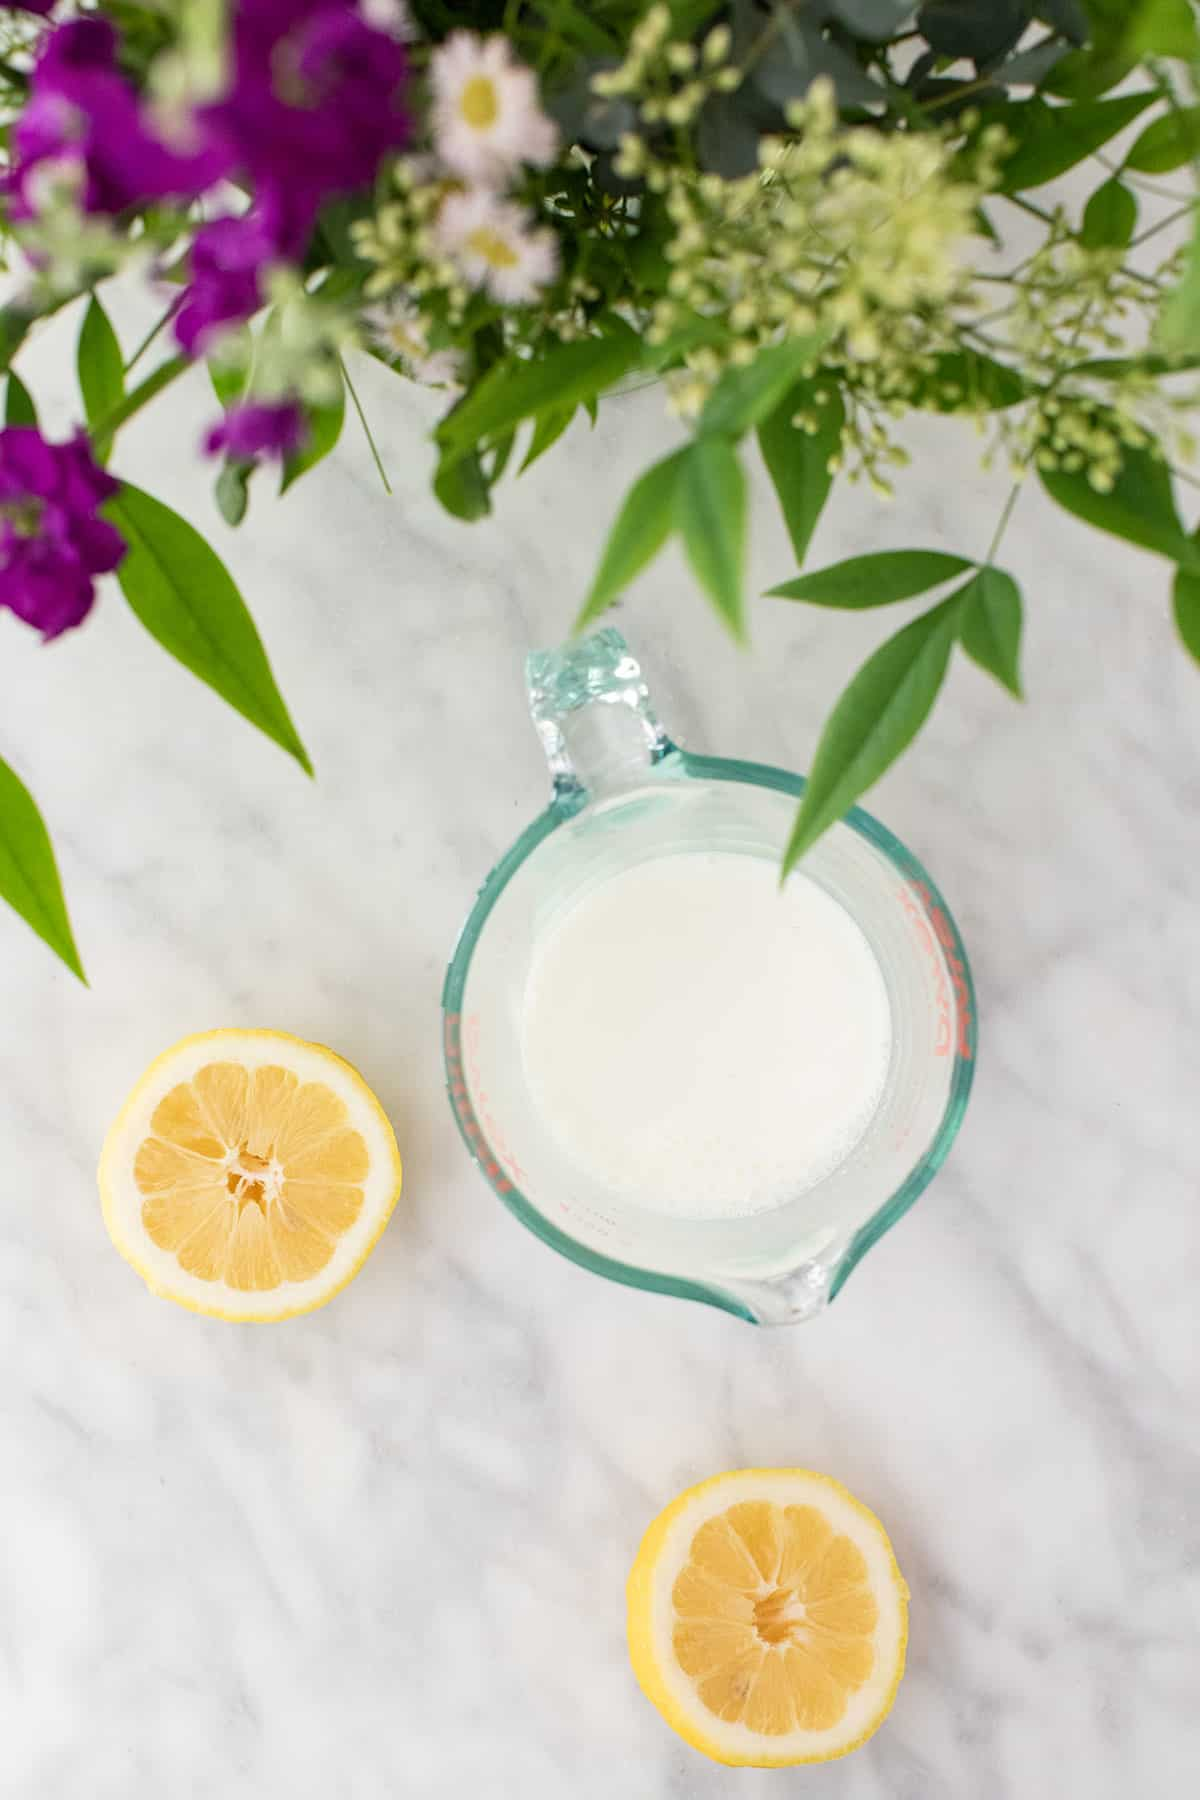 Milk and lemons on a table